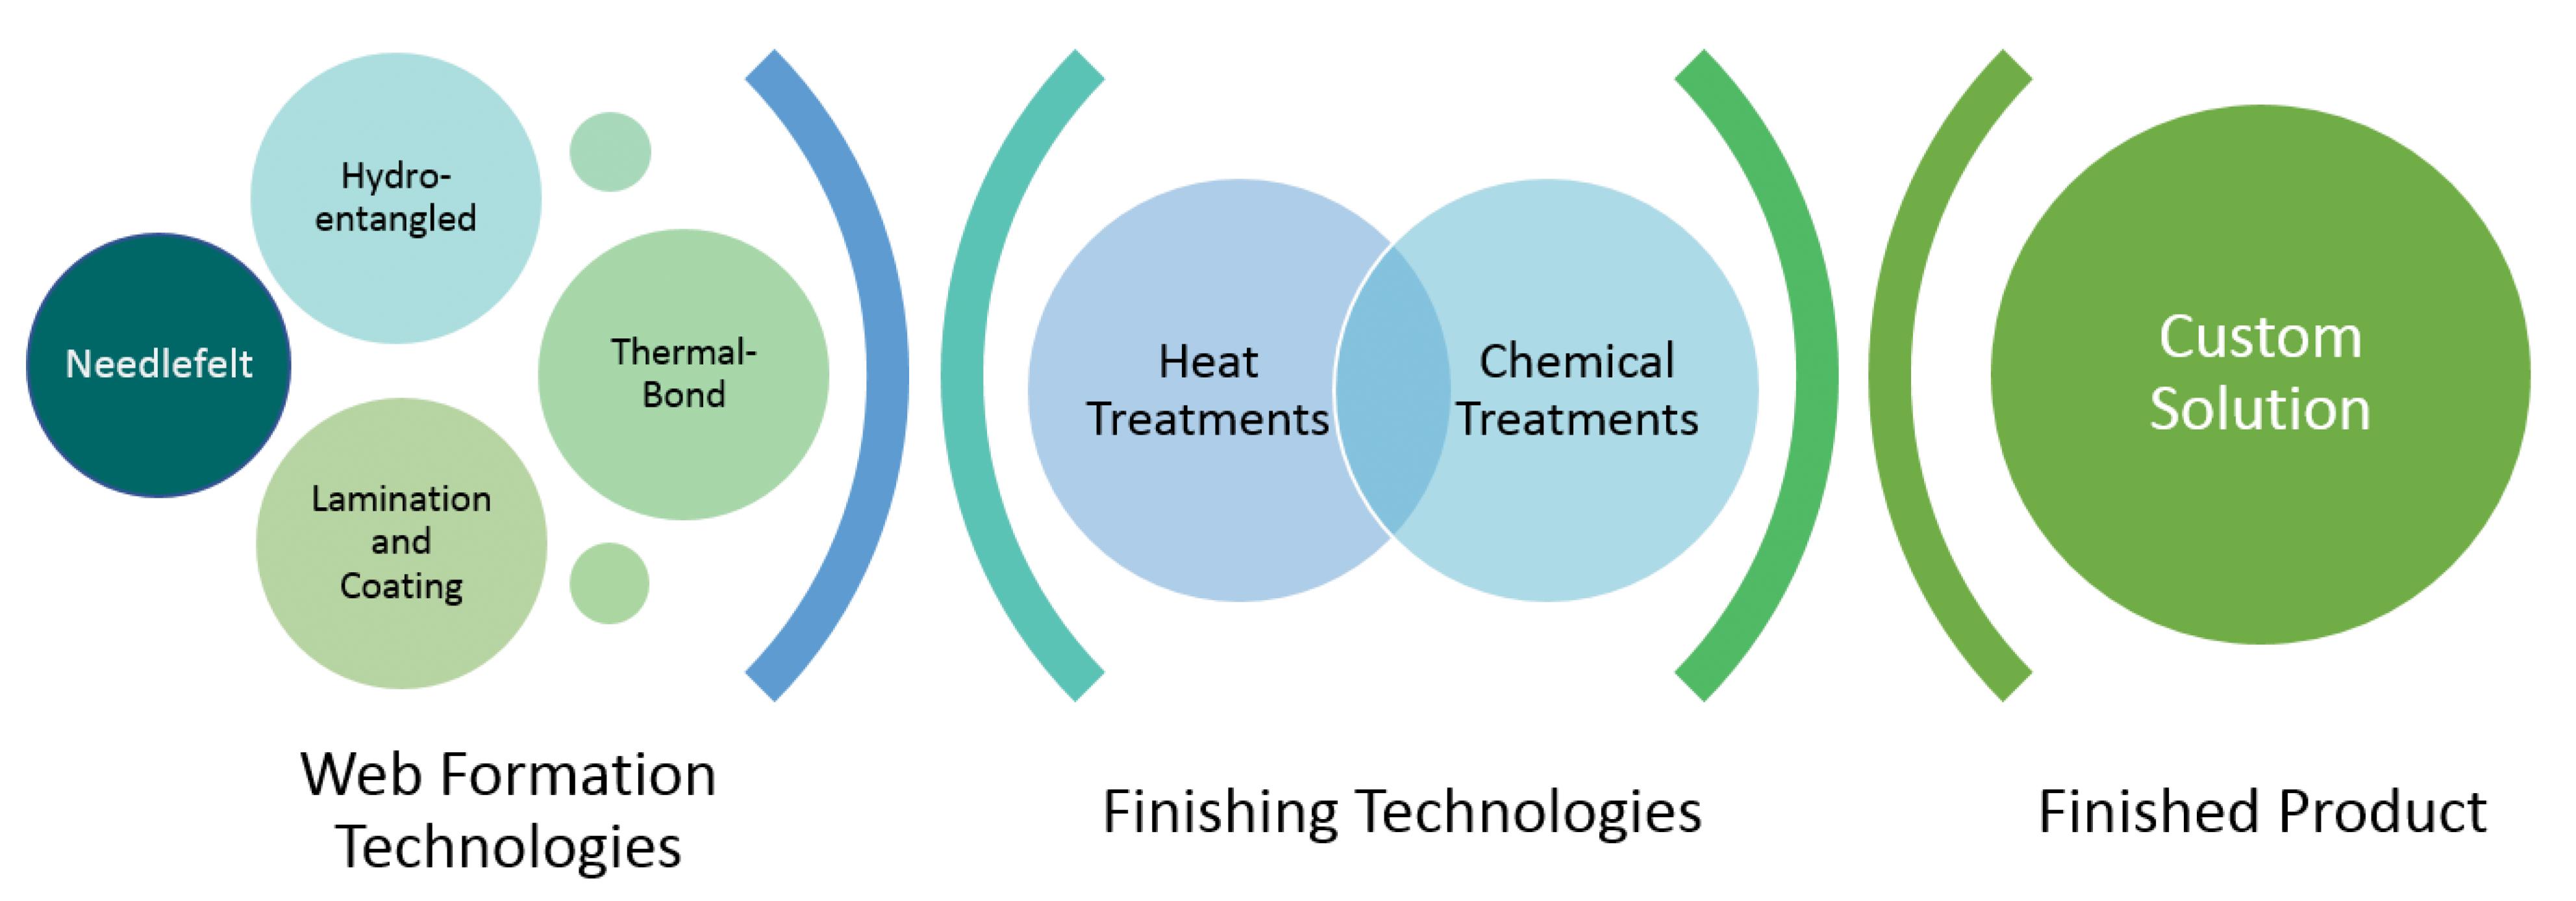 Bondex custom thermal bonded hydro-entangled spunlace solutions